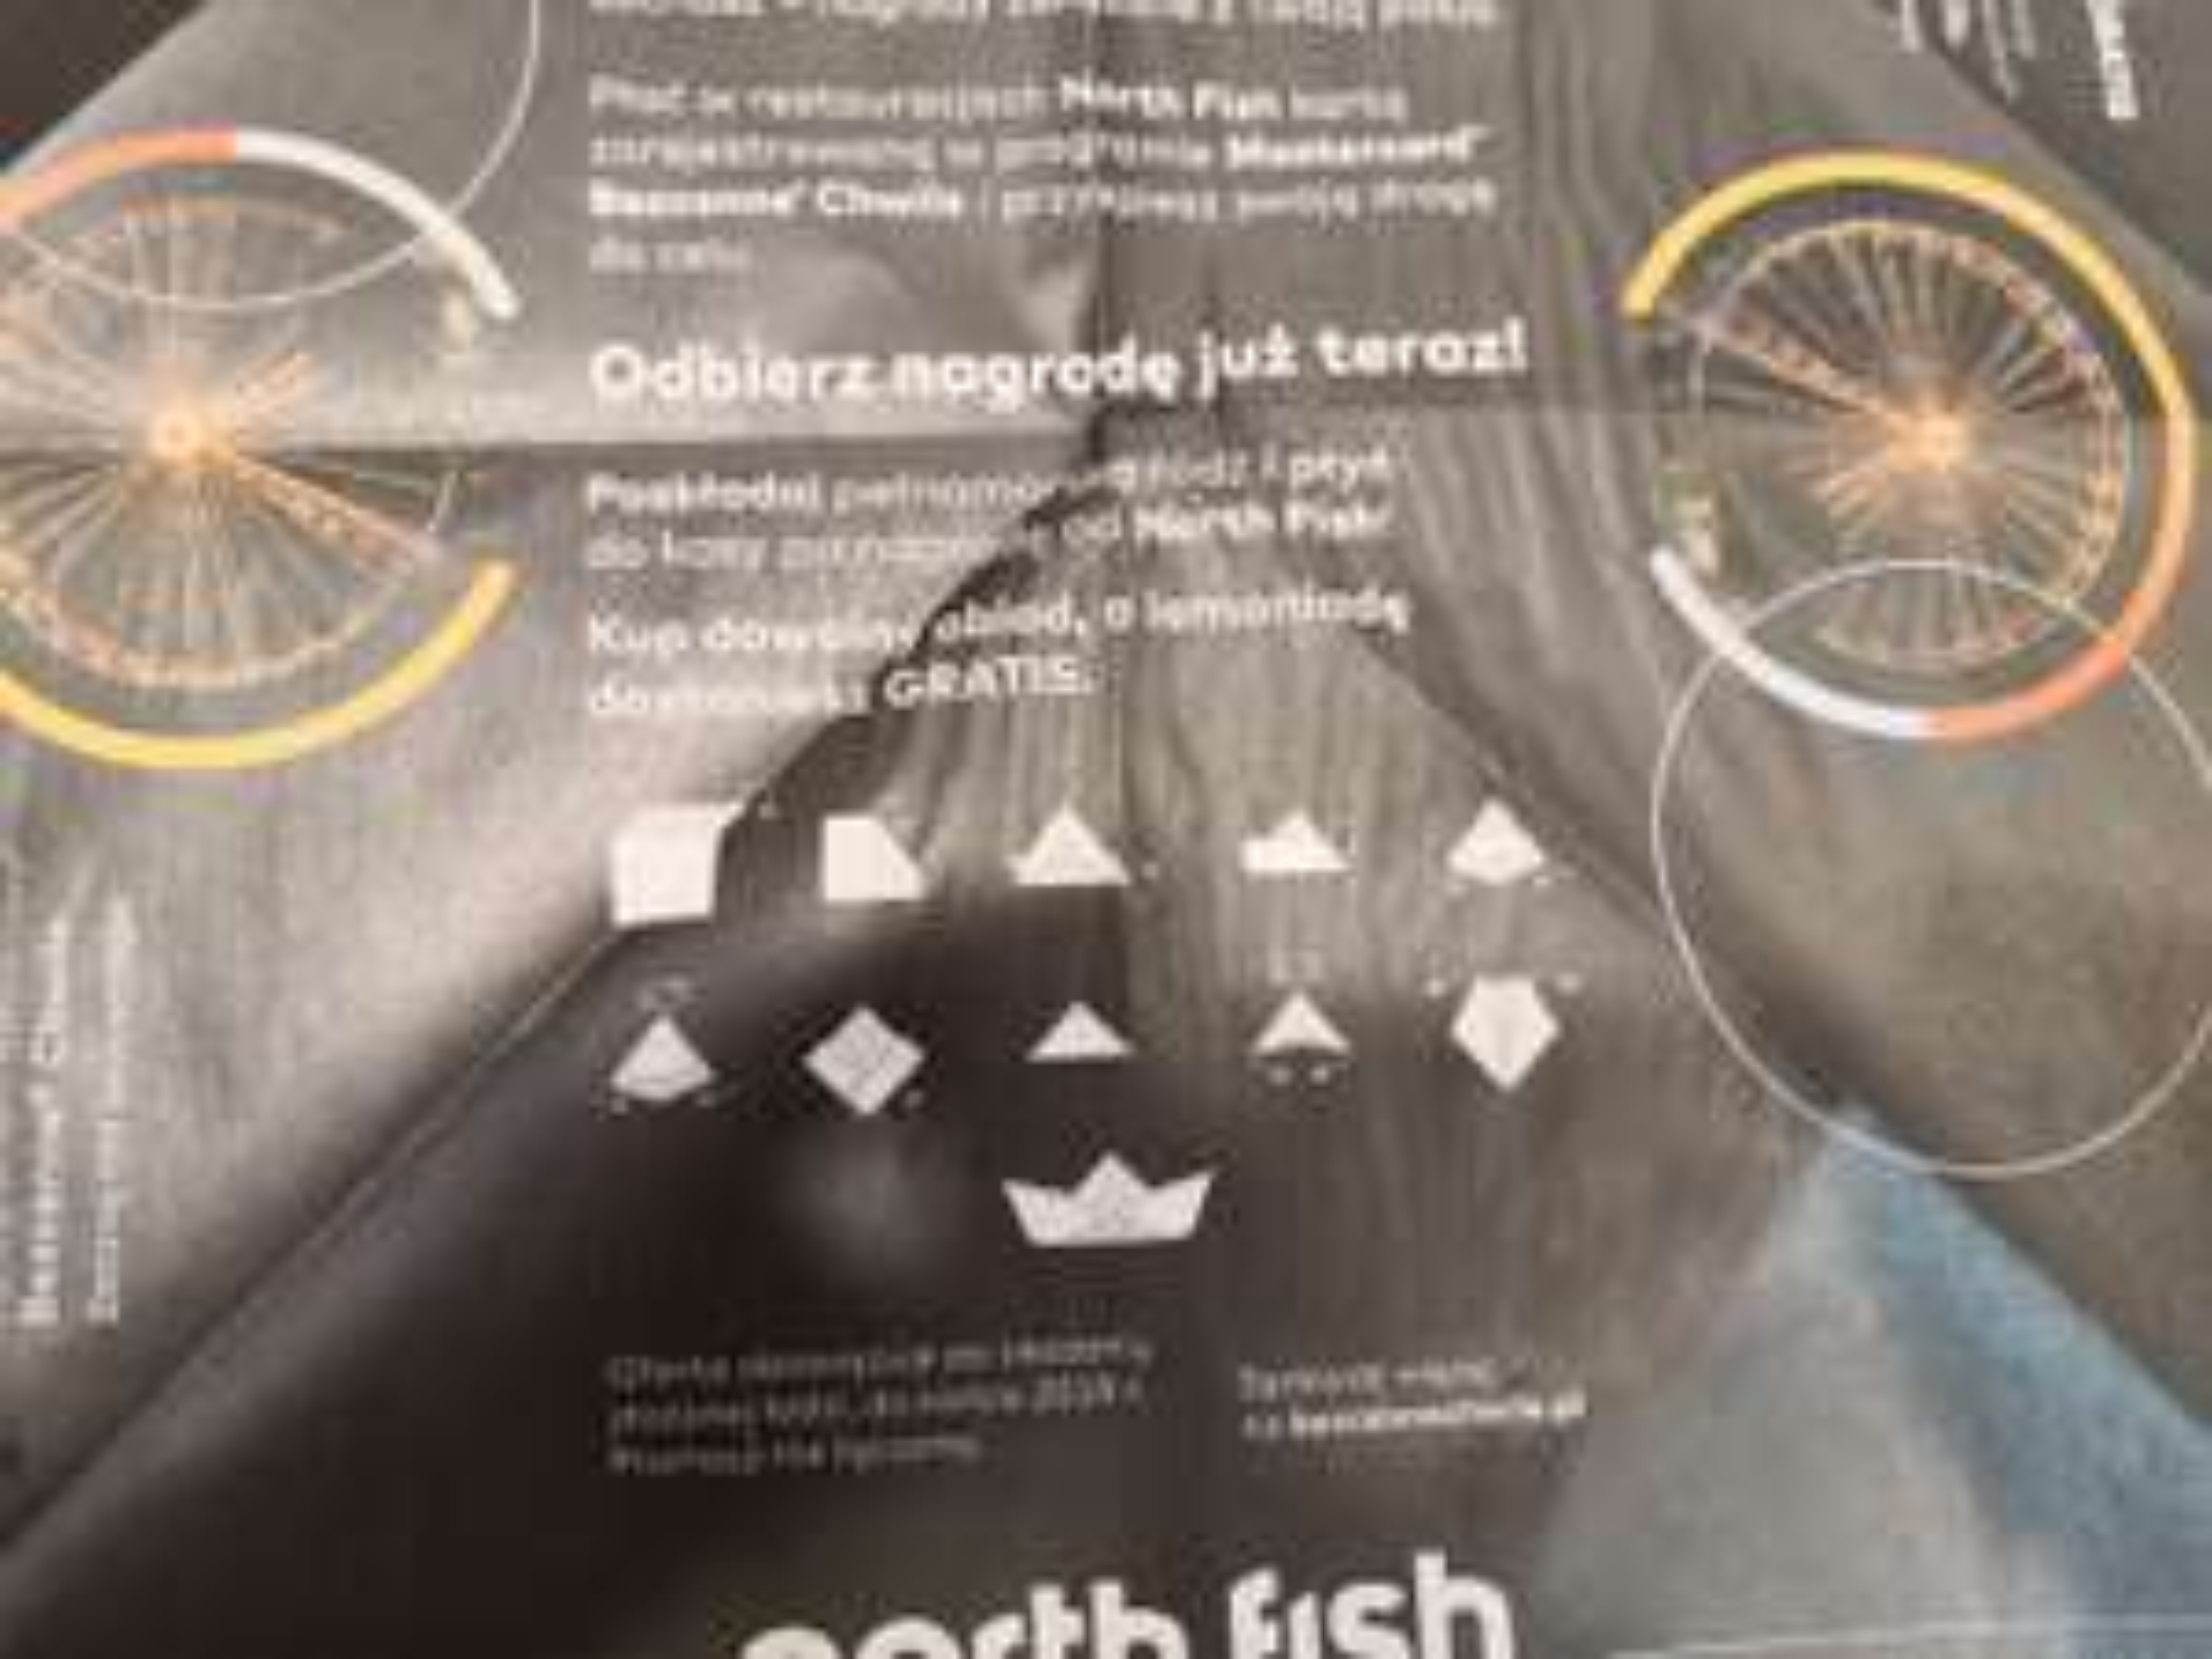 Darmowa lemoniada w North Fish